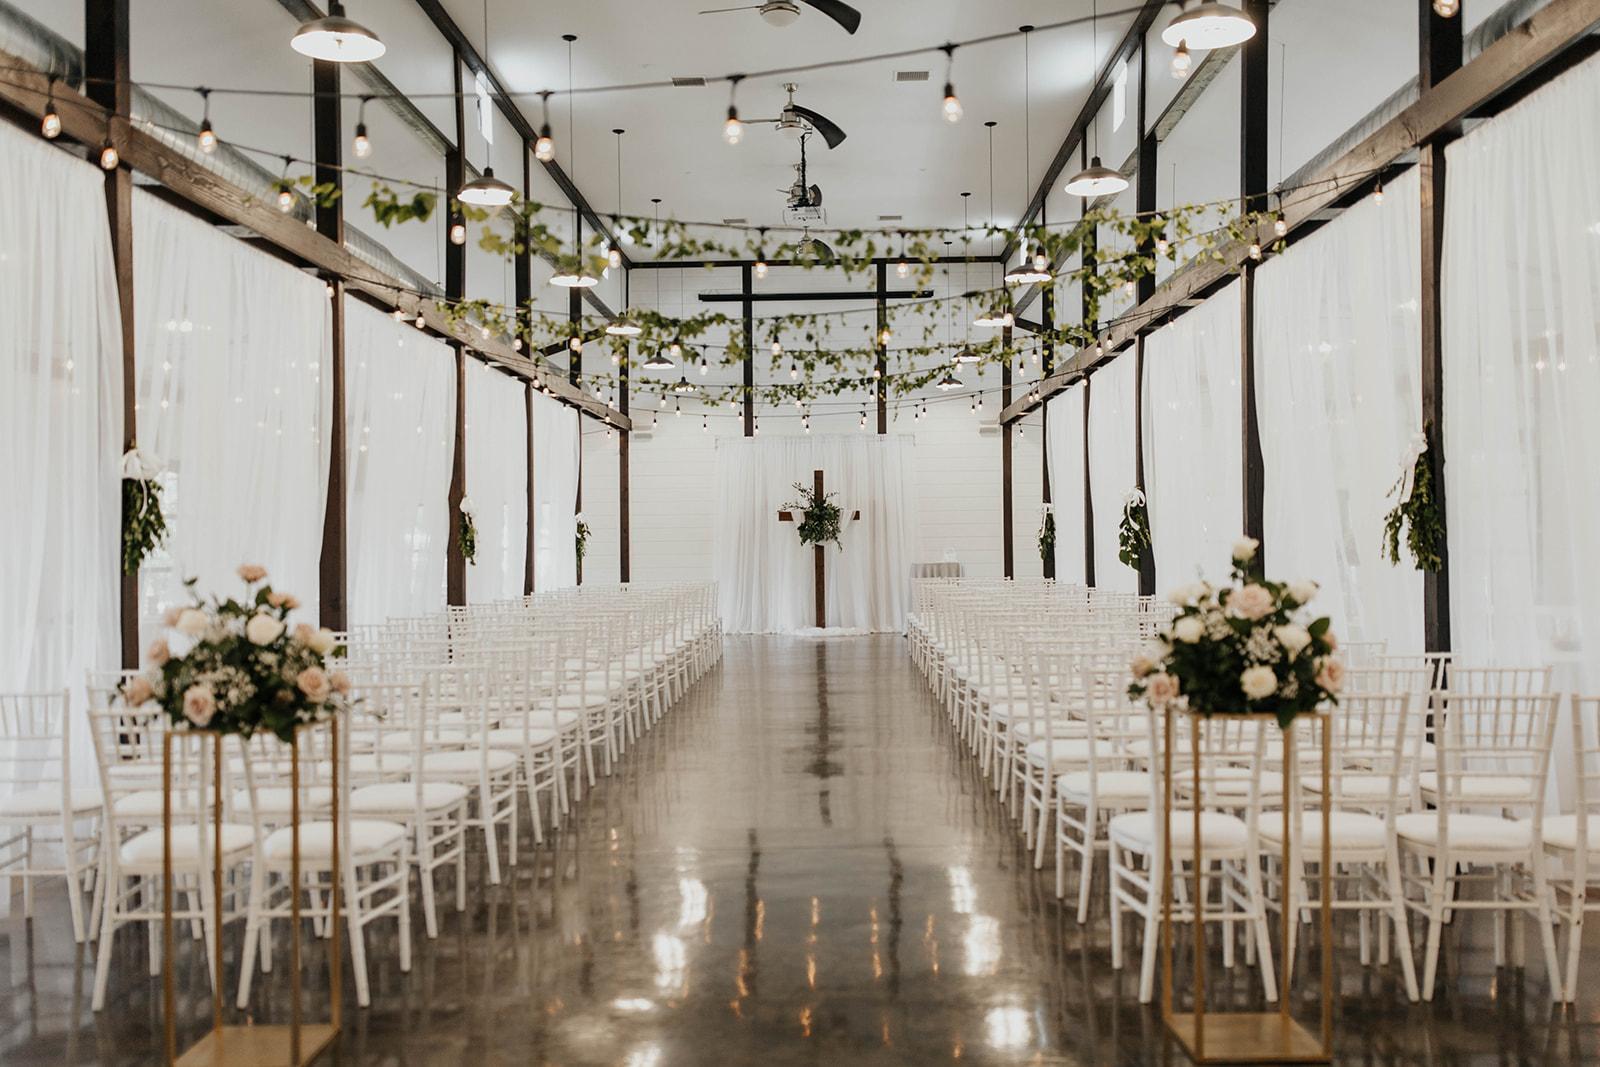 Tulsa Bixby Oklahoma Best Wedding and Reception Venue 0.jpg